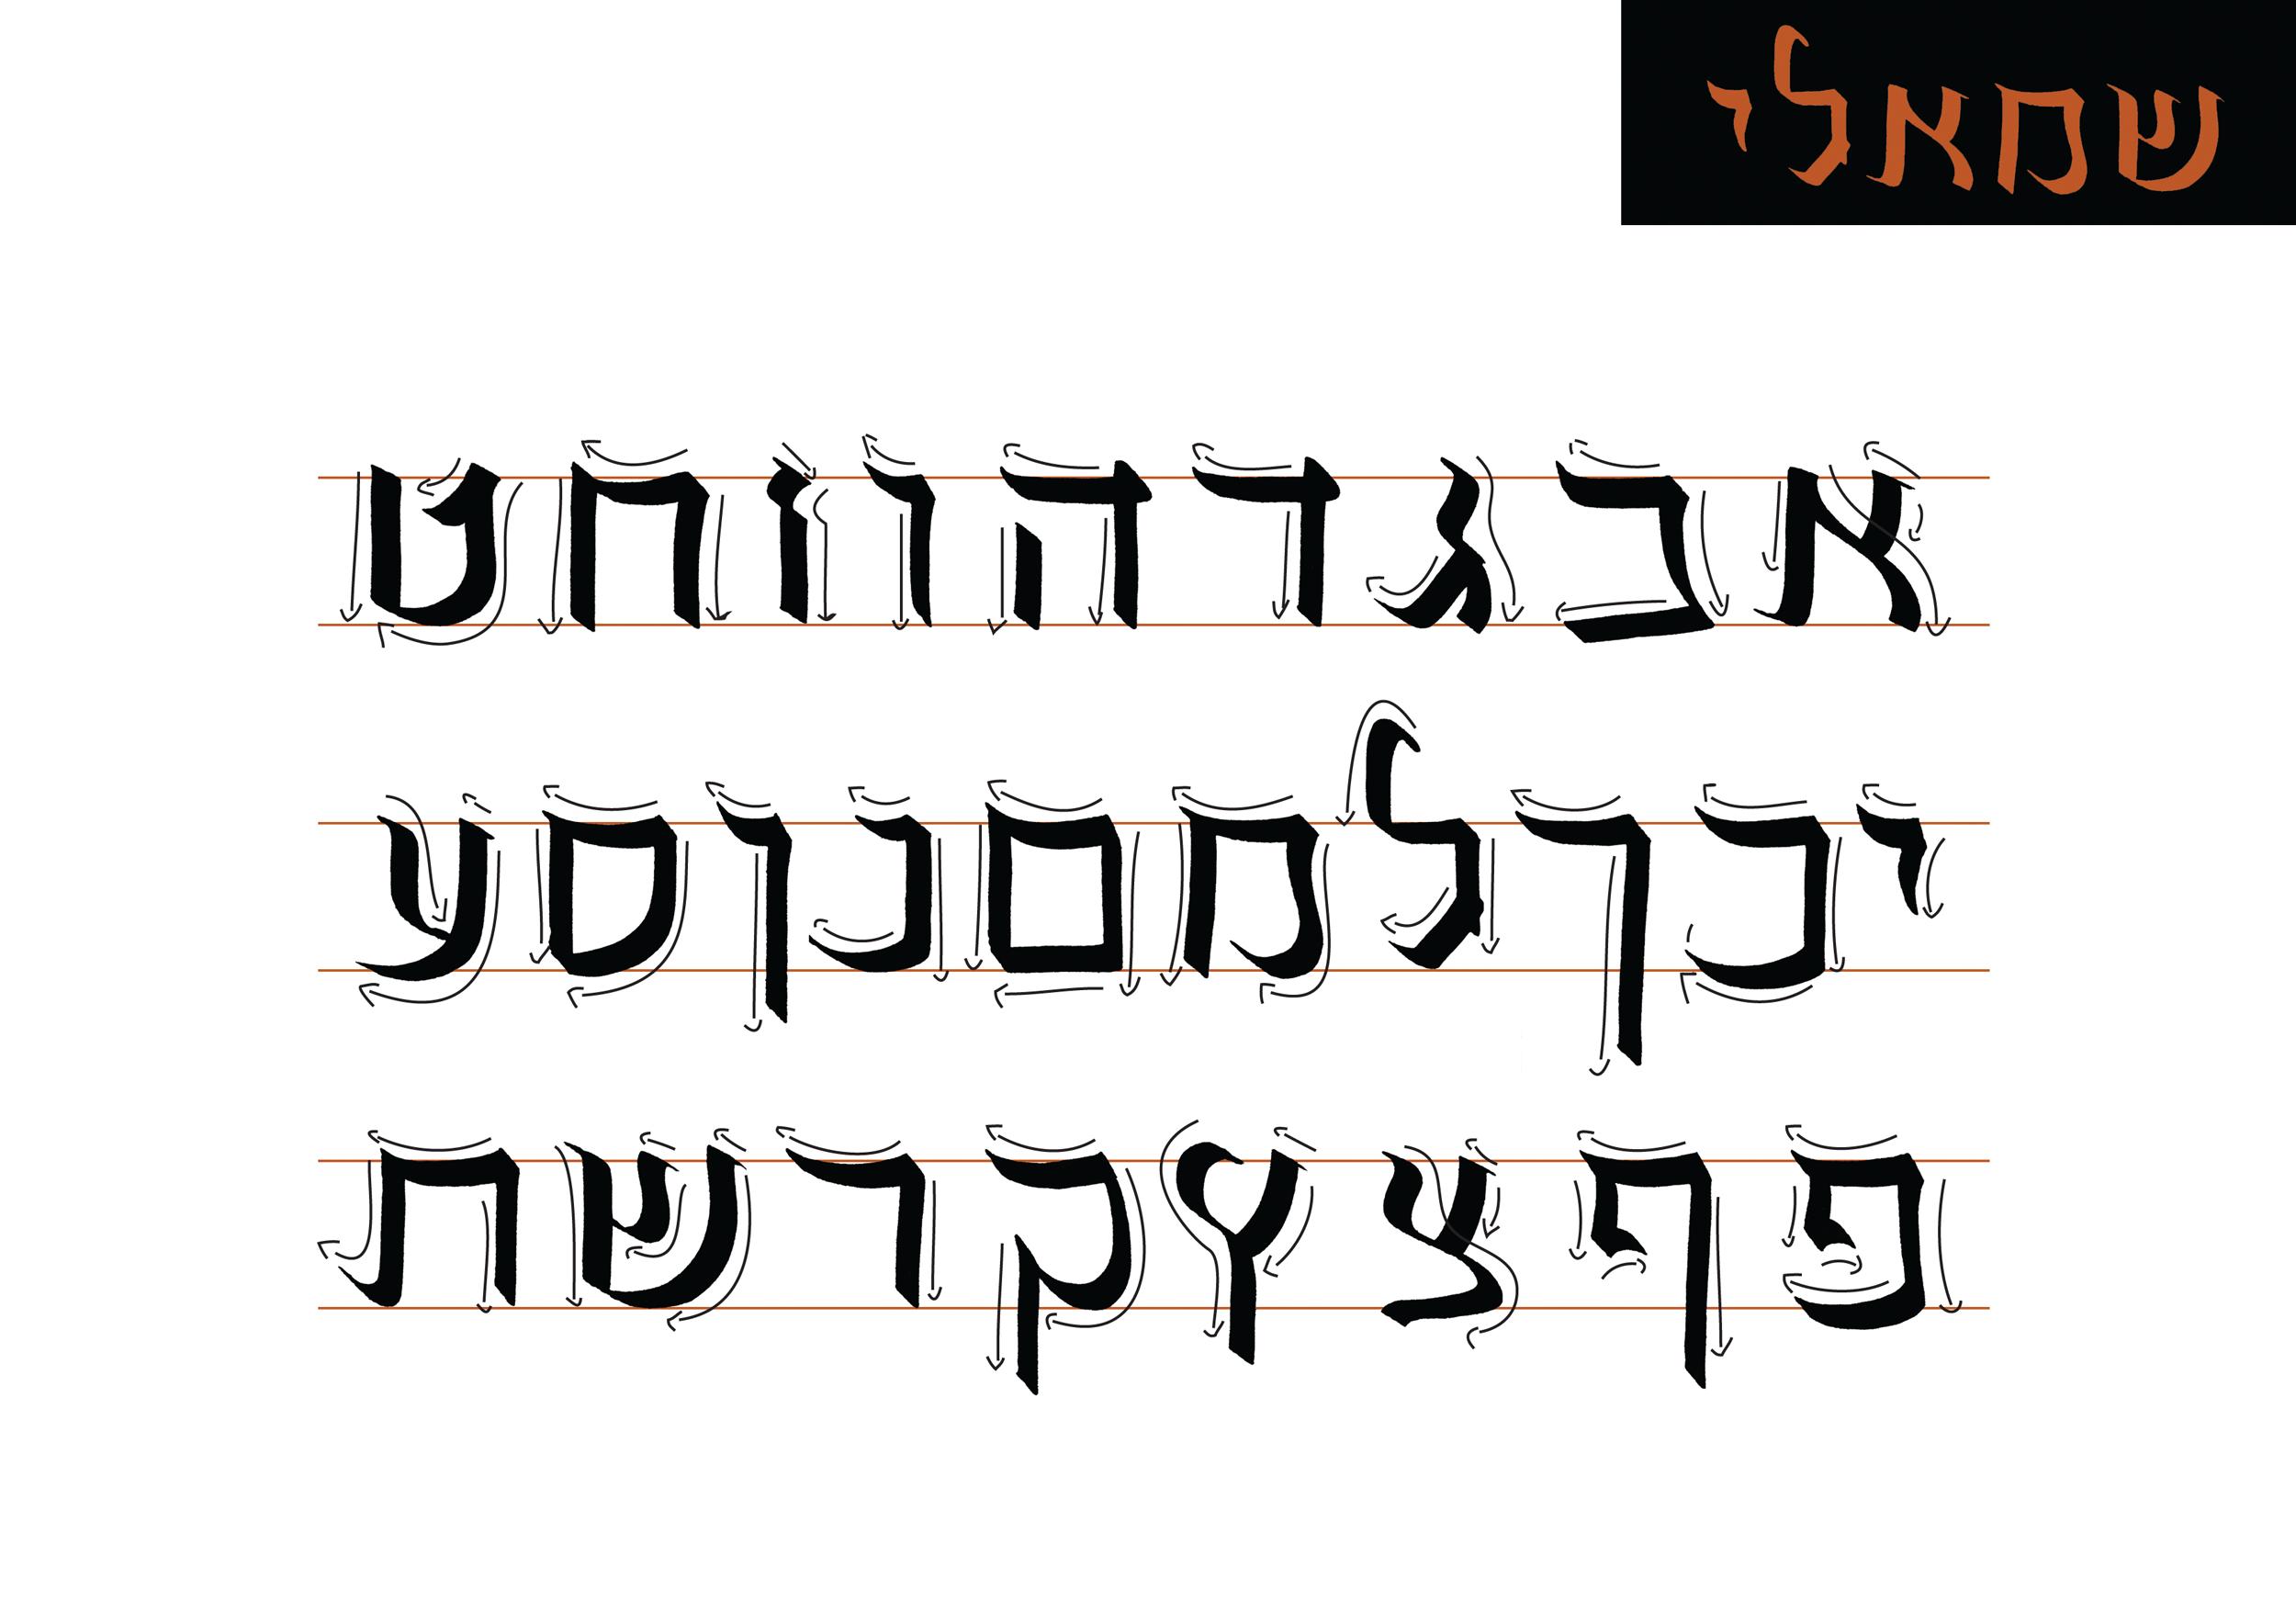 Free tattoo fonts autos weblog Cool caligraphy fonts